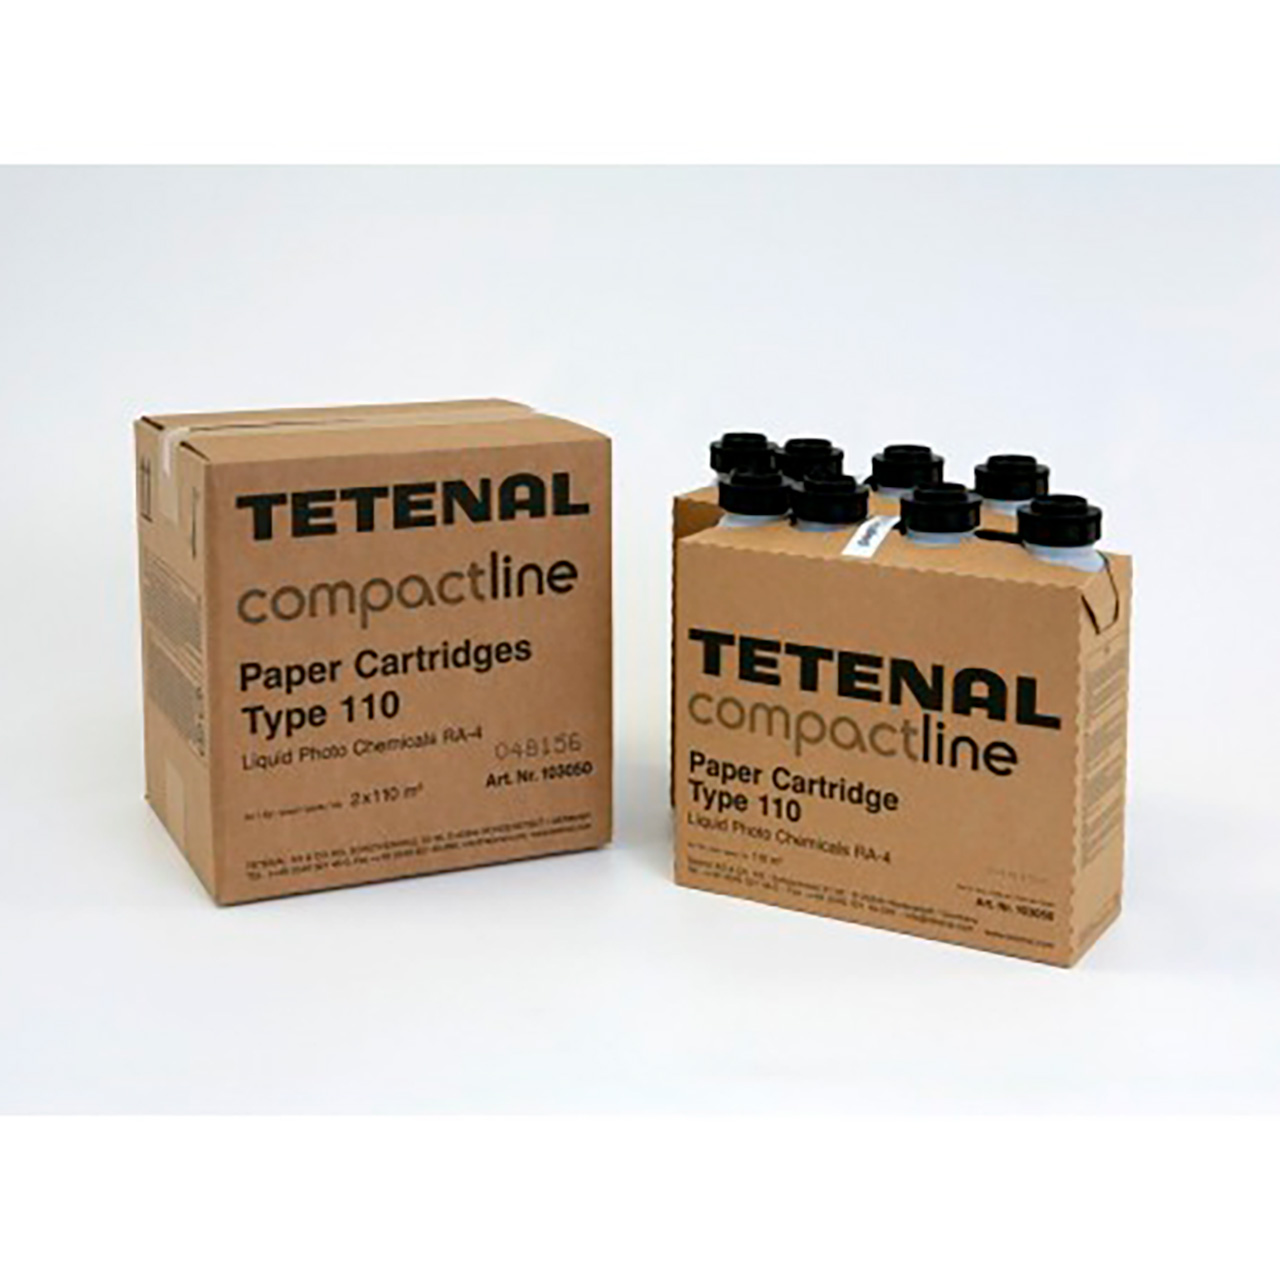 Tetenal Químico RA Agfa Dlab 1 y 2 Type 110